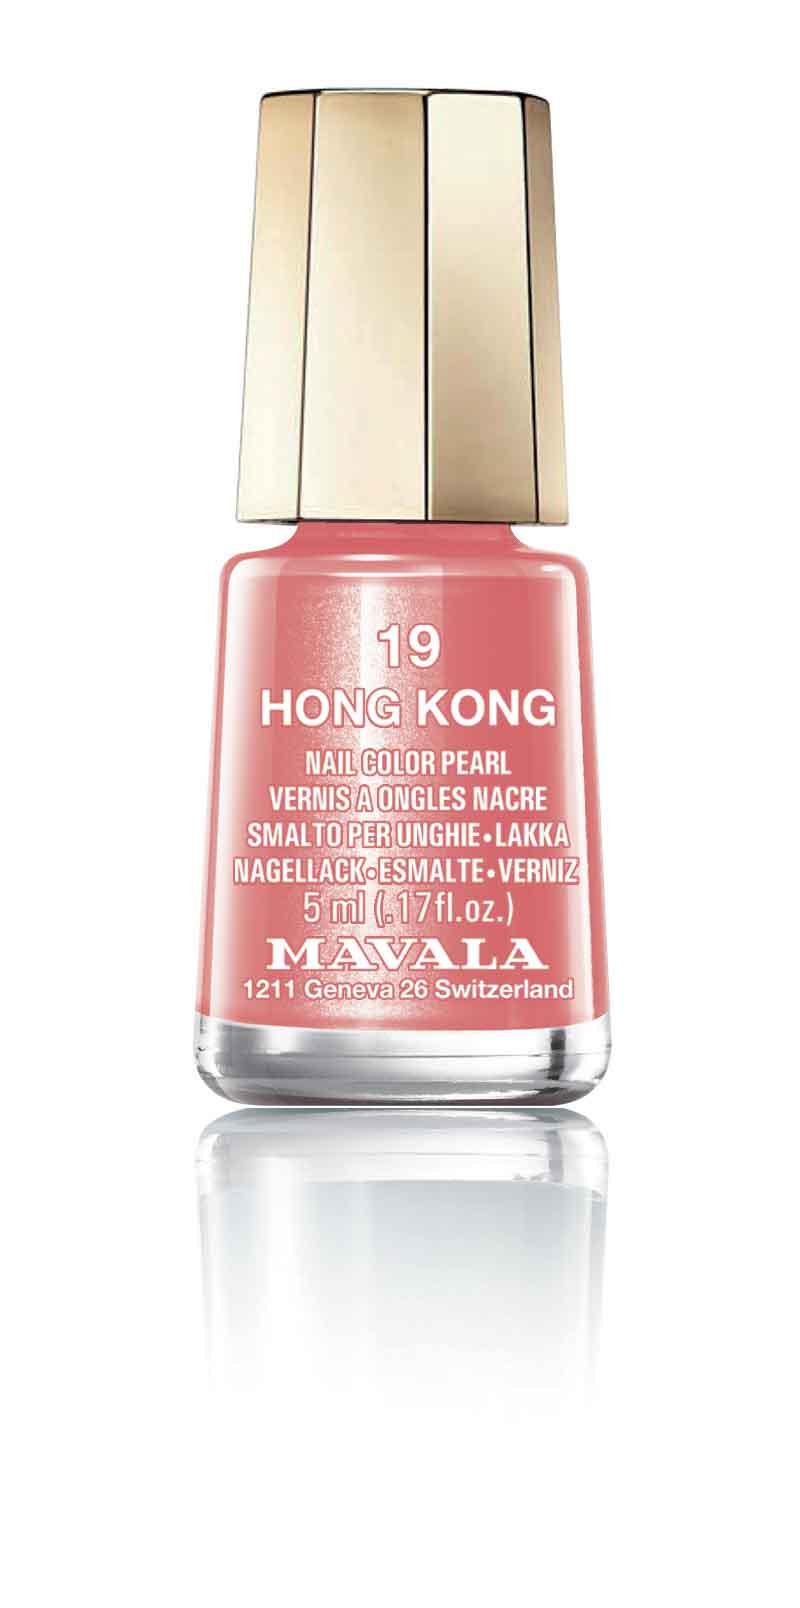 19 HONG KONG